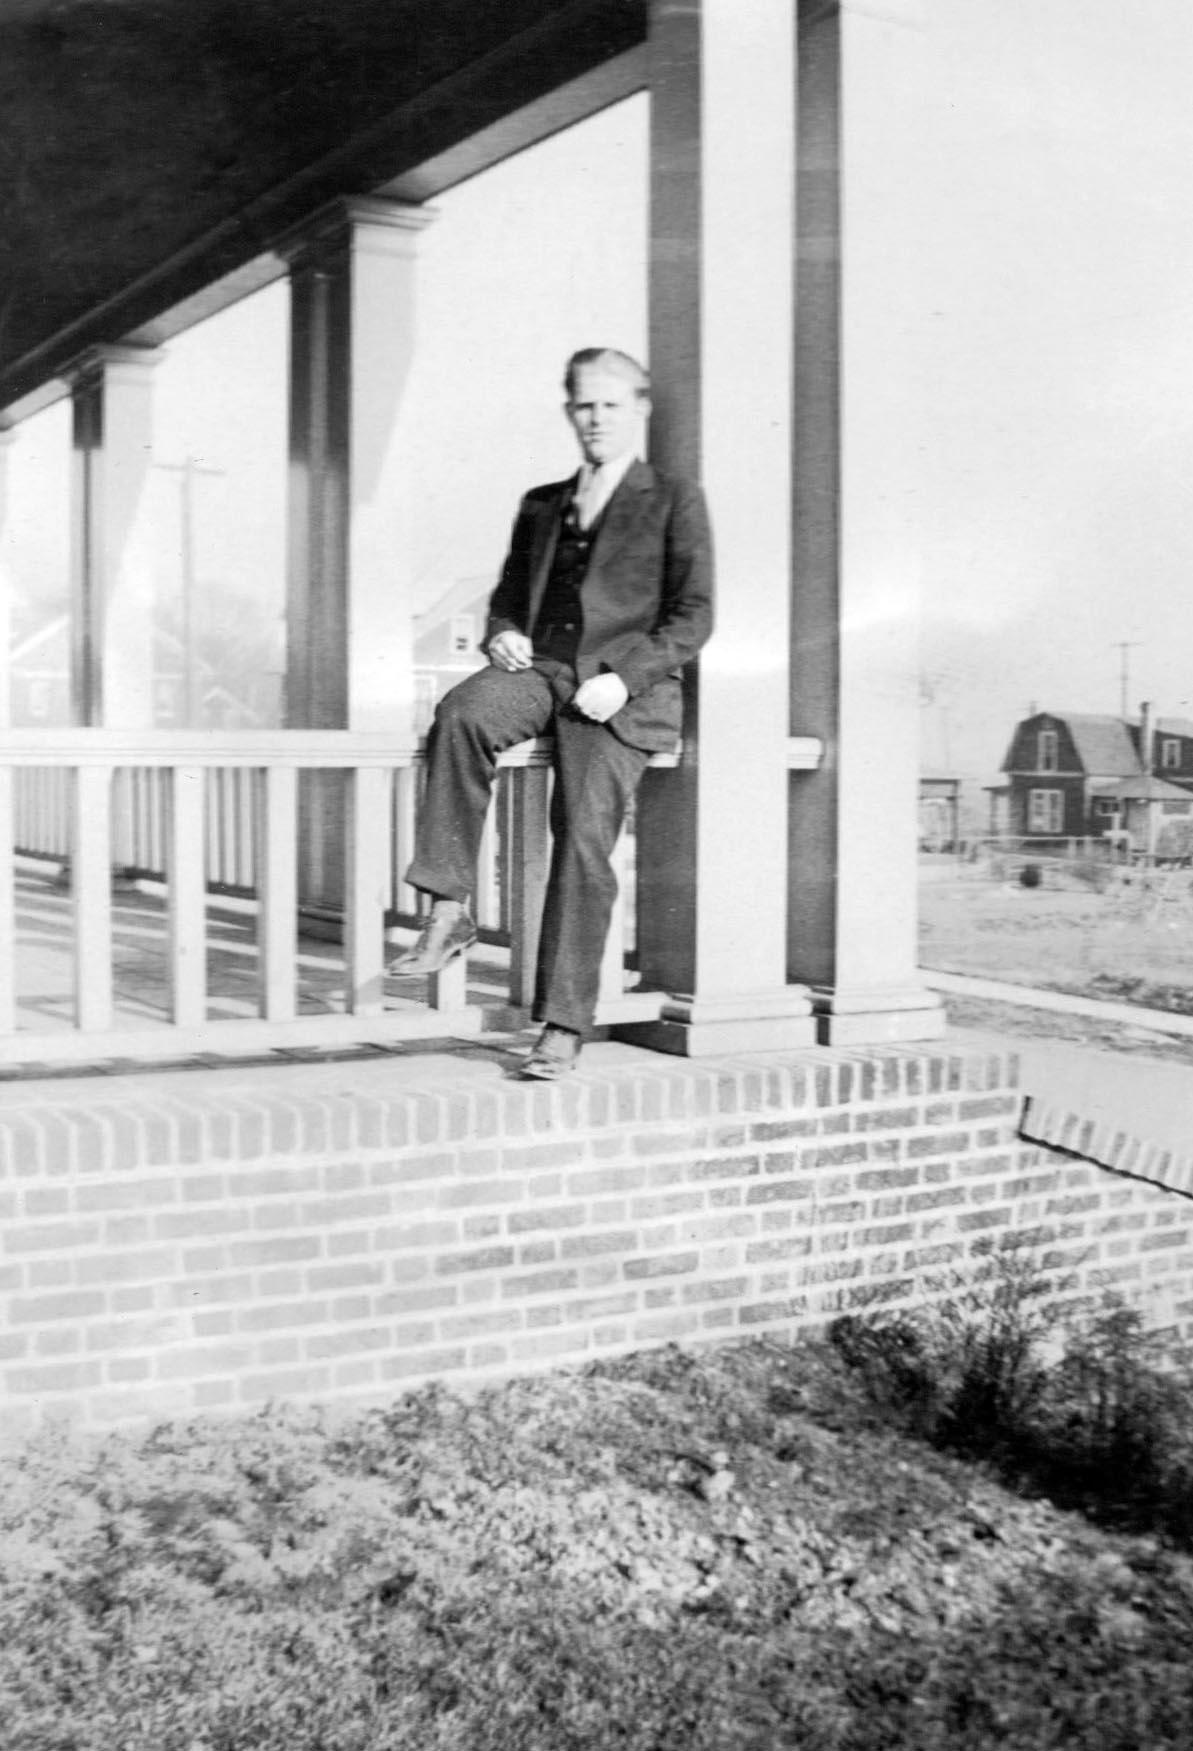 William C. Ings Jr. 1936